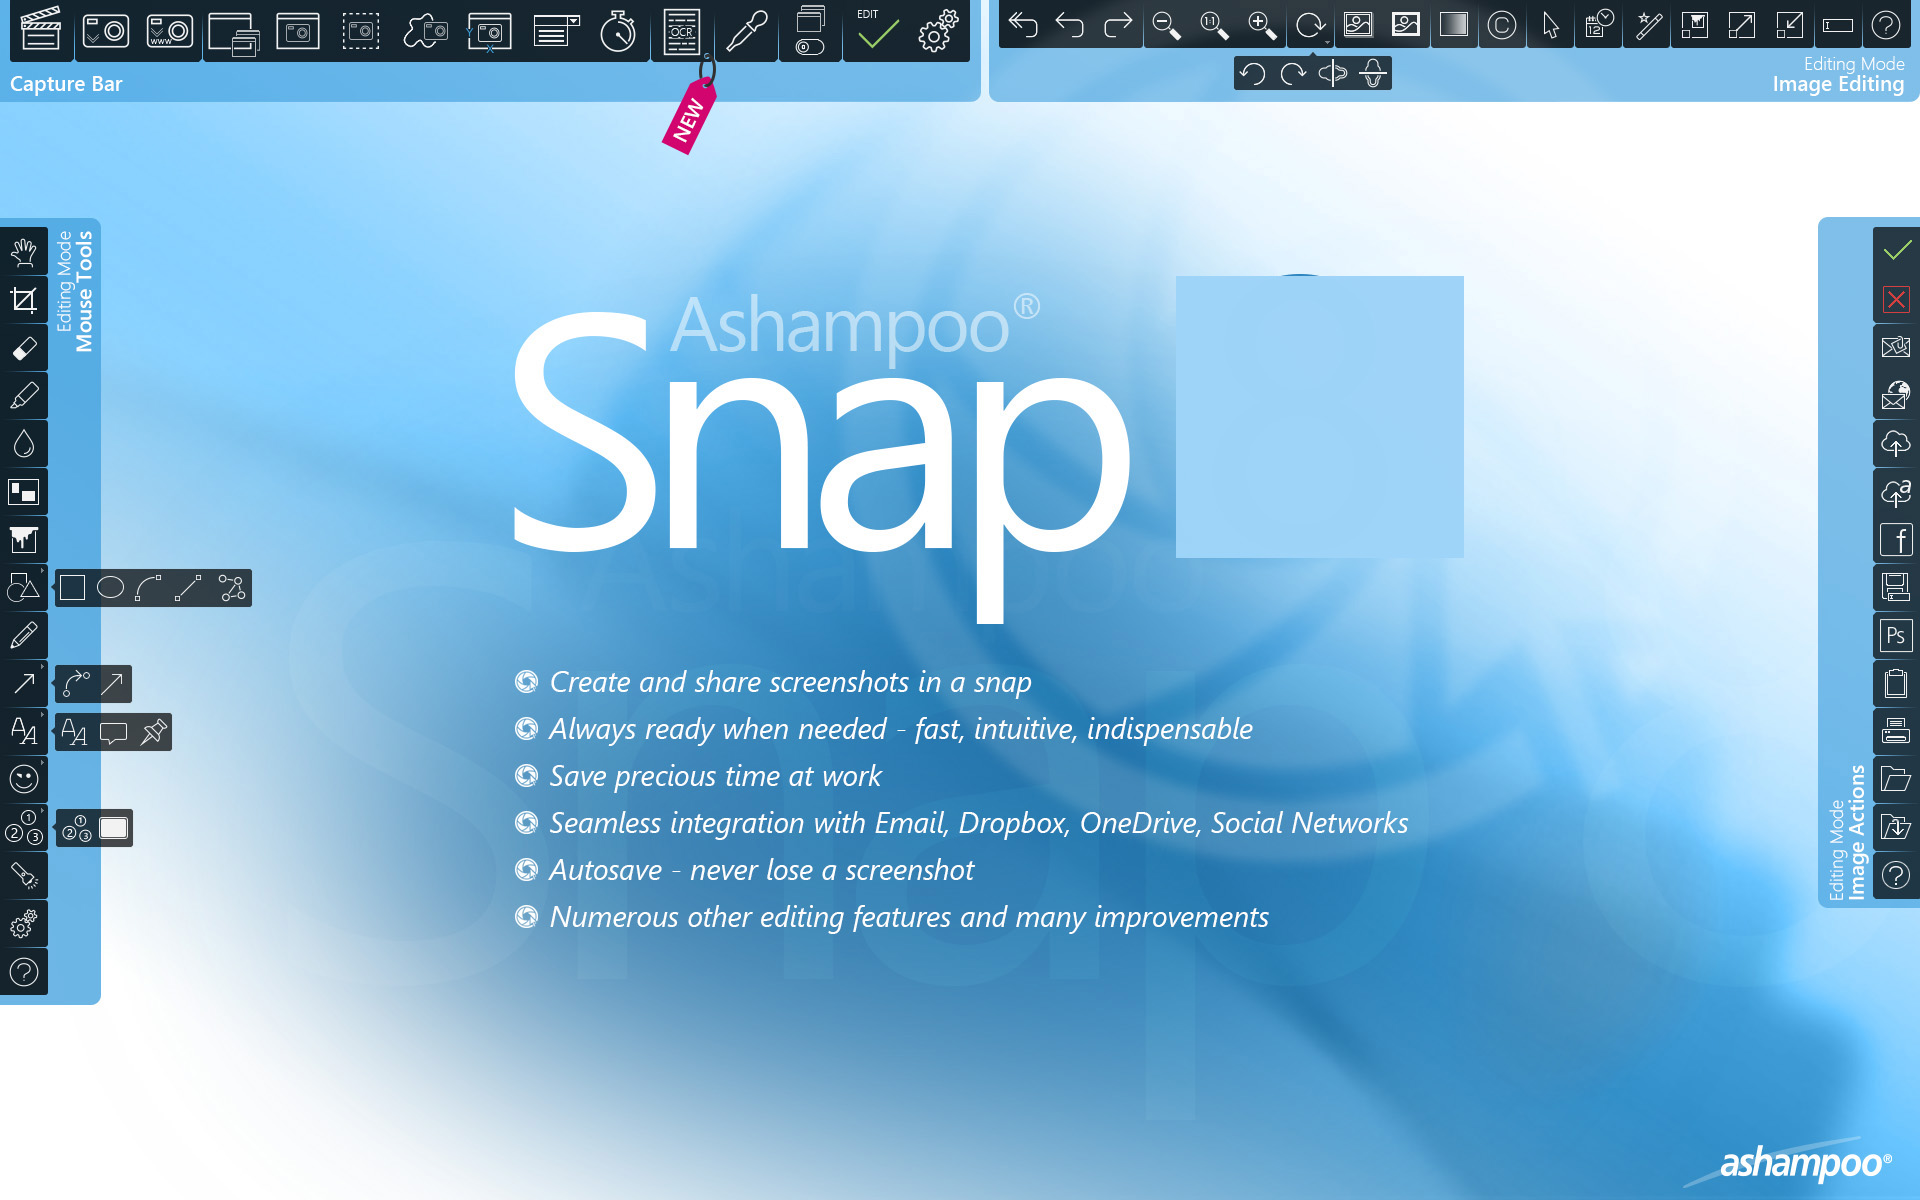 Ashampoo Snap windows